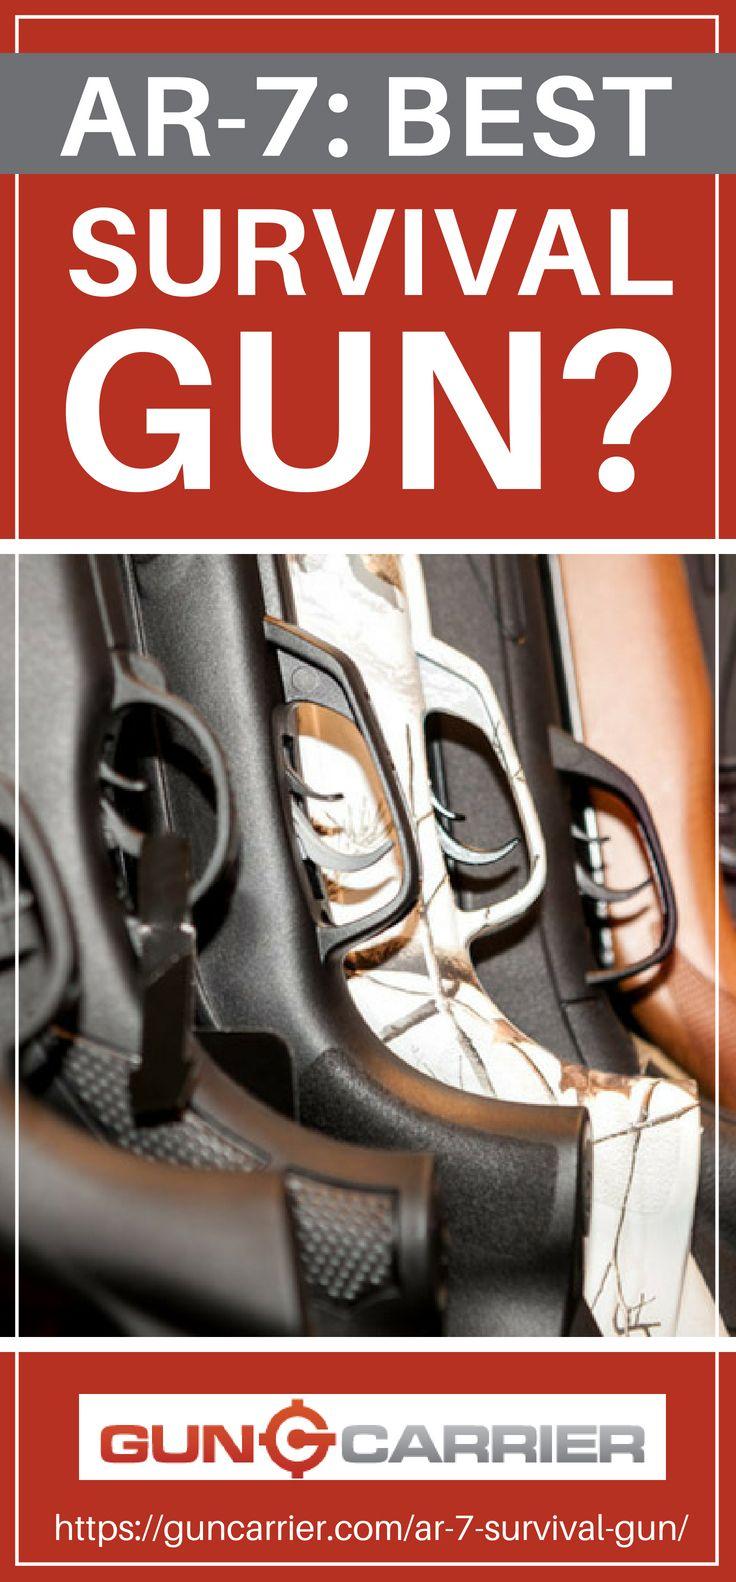 AR-7 | Best Survival Gun? | https://guncarrier.com/ar-7-survival-gun/